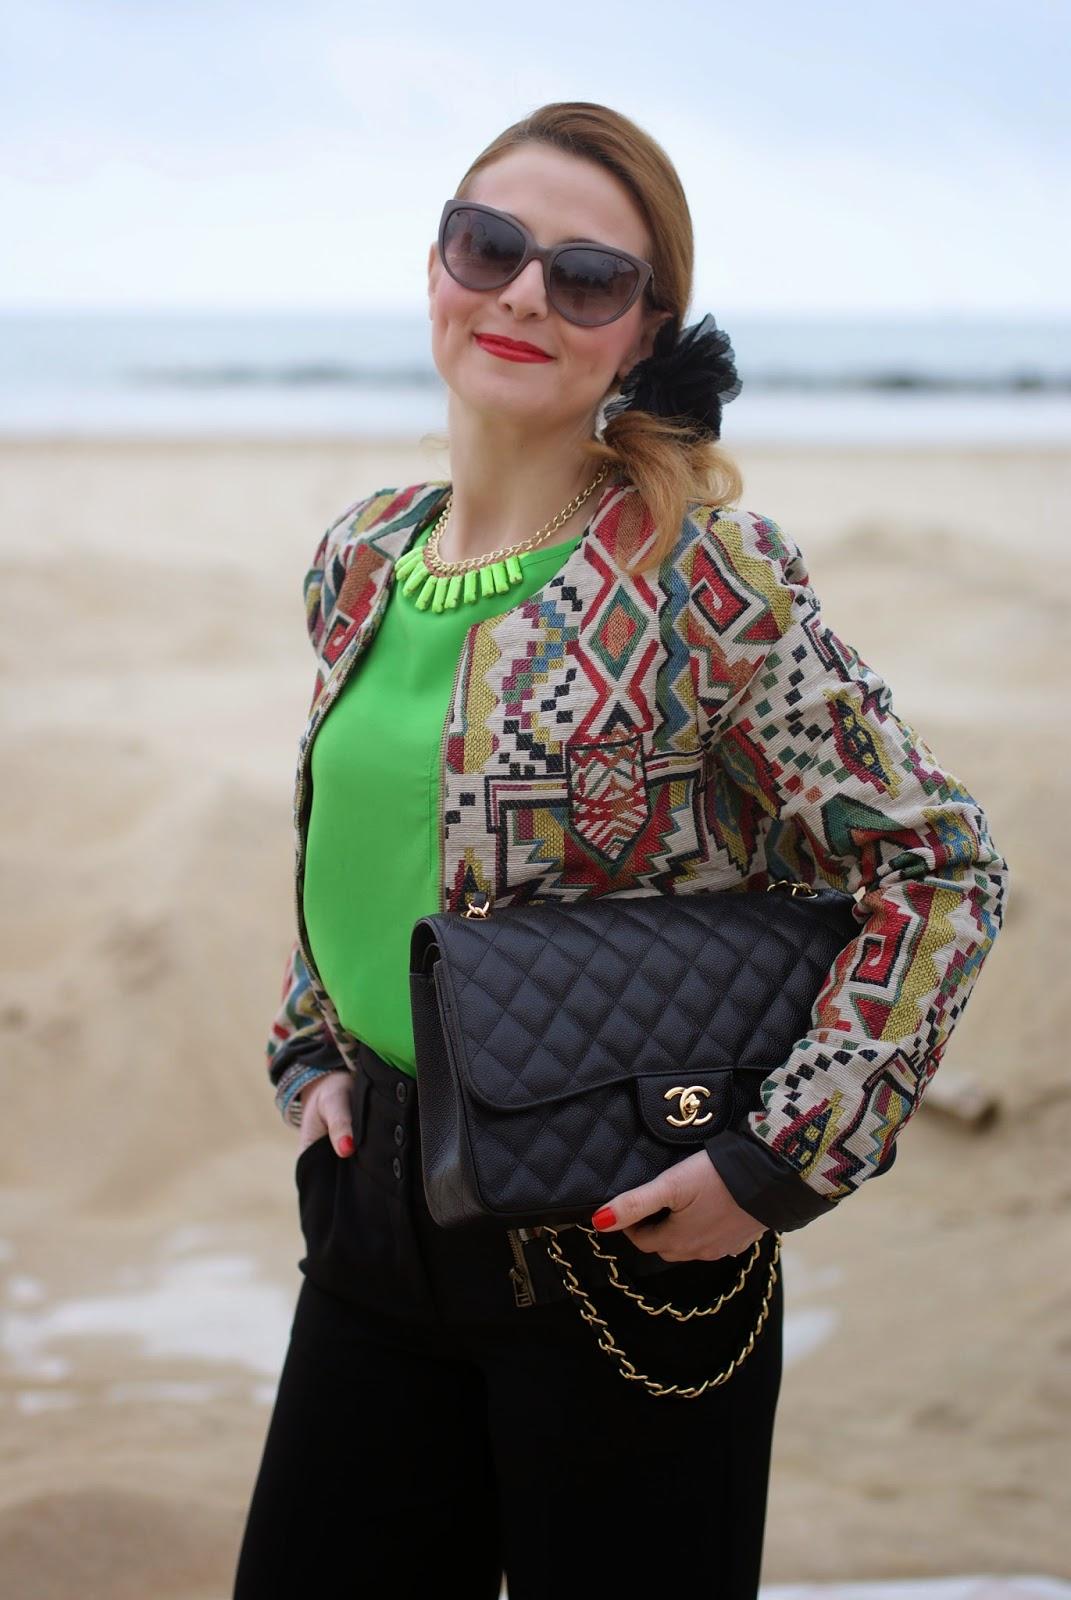 Chanel 2.55 classic flap bag, neon green blouse, Paramita jacket, bomber jacket, Moliabal elastico capelli, palazzo pants, Lunatic pantaloni, sided ponytail, Fashion and Cookies fashion blog, fashion blogger